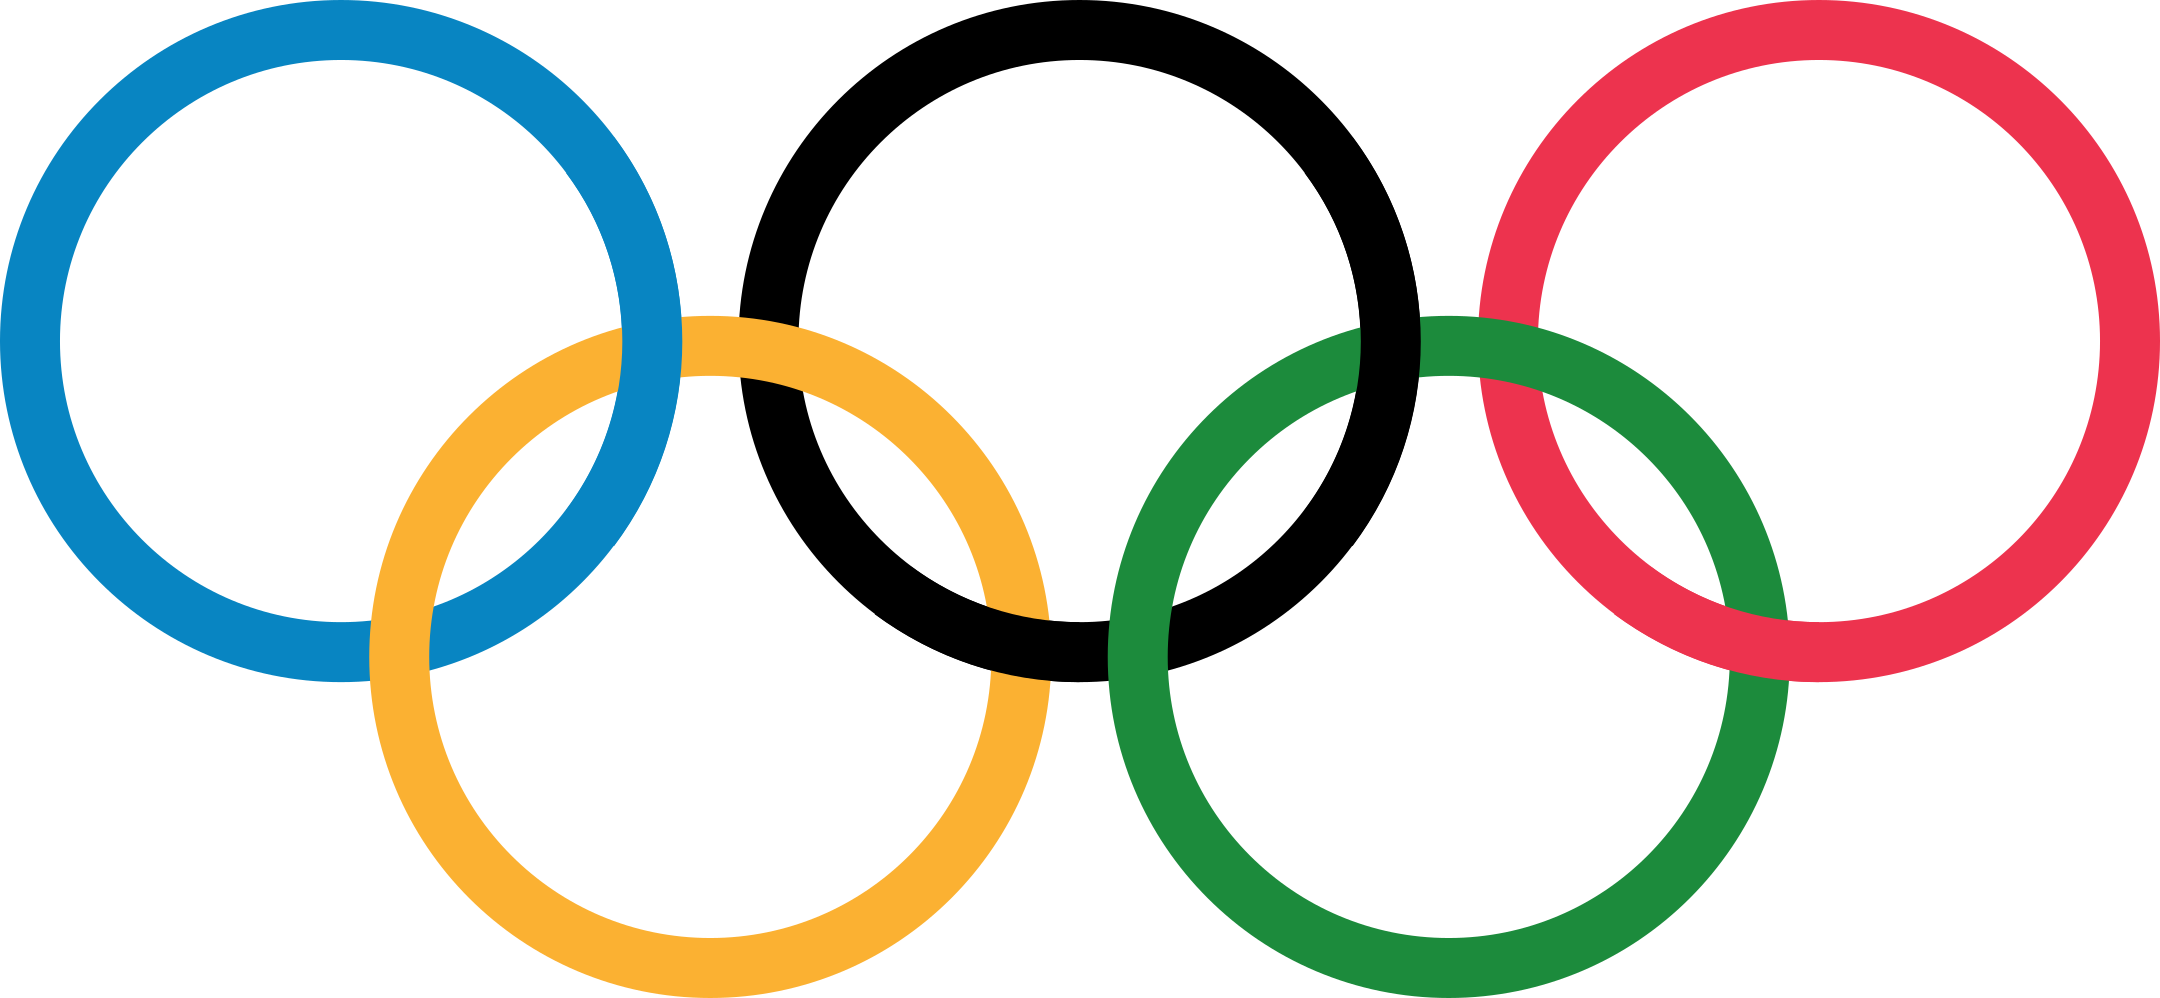 olimpiada olympic games logo 1 - Juegos Olímpicos - Olimpiada Logo